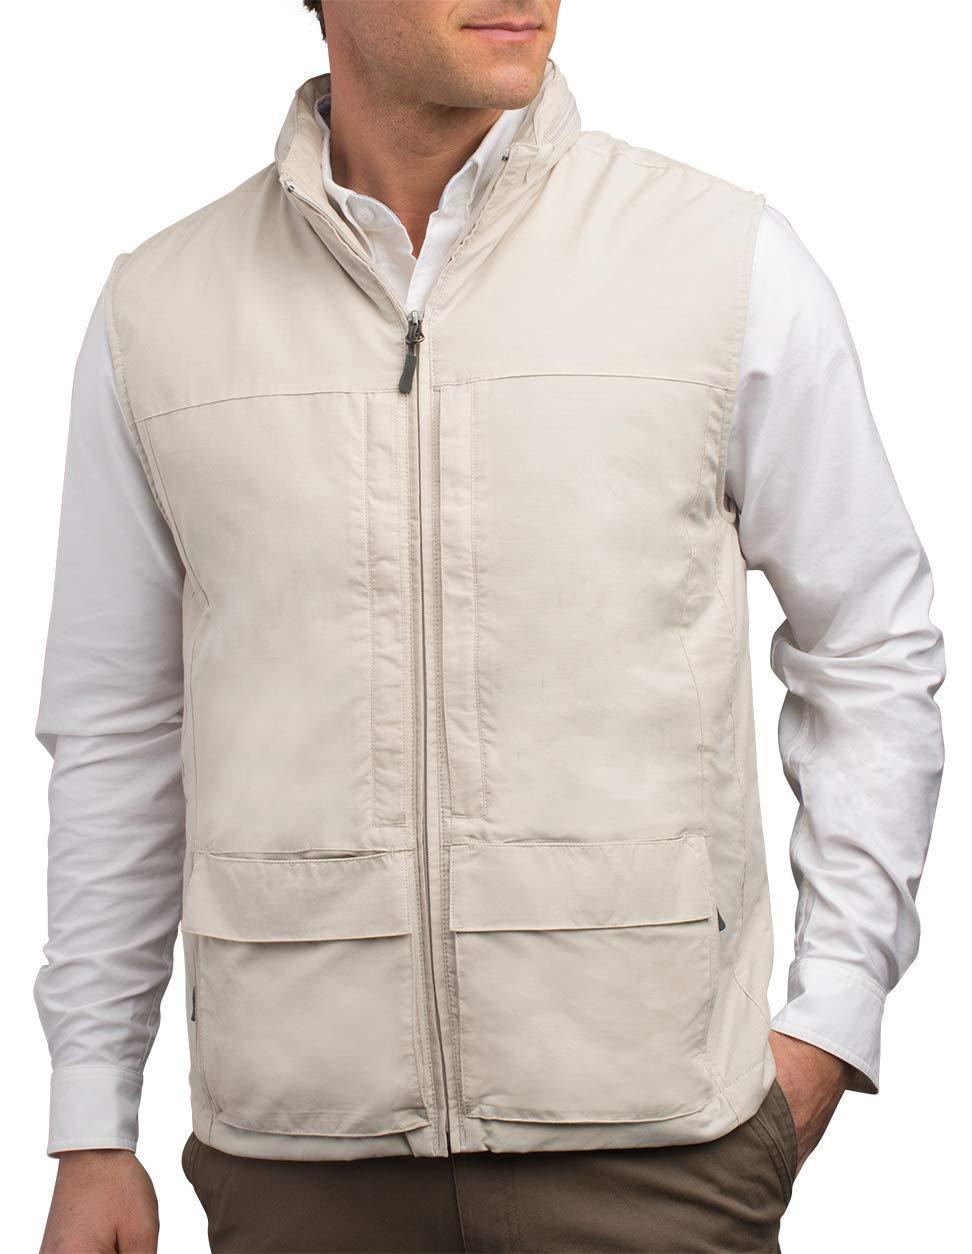 SCOTTeVEST Quest Vest for Men - 42 Pockets - Travel Utility Vest - Stowable Hood